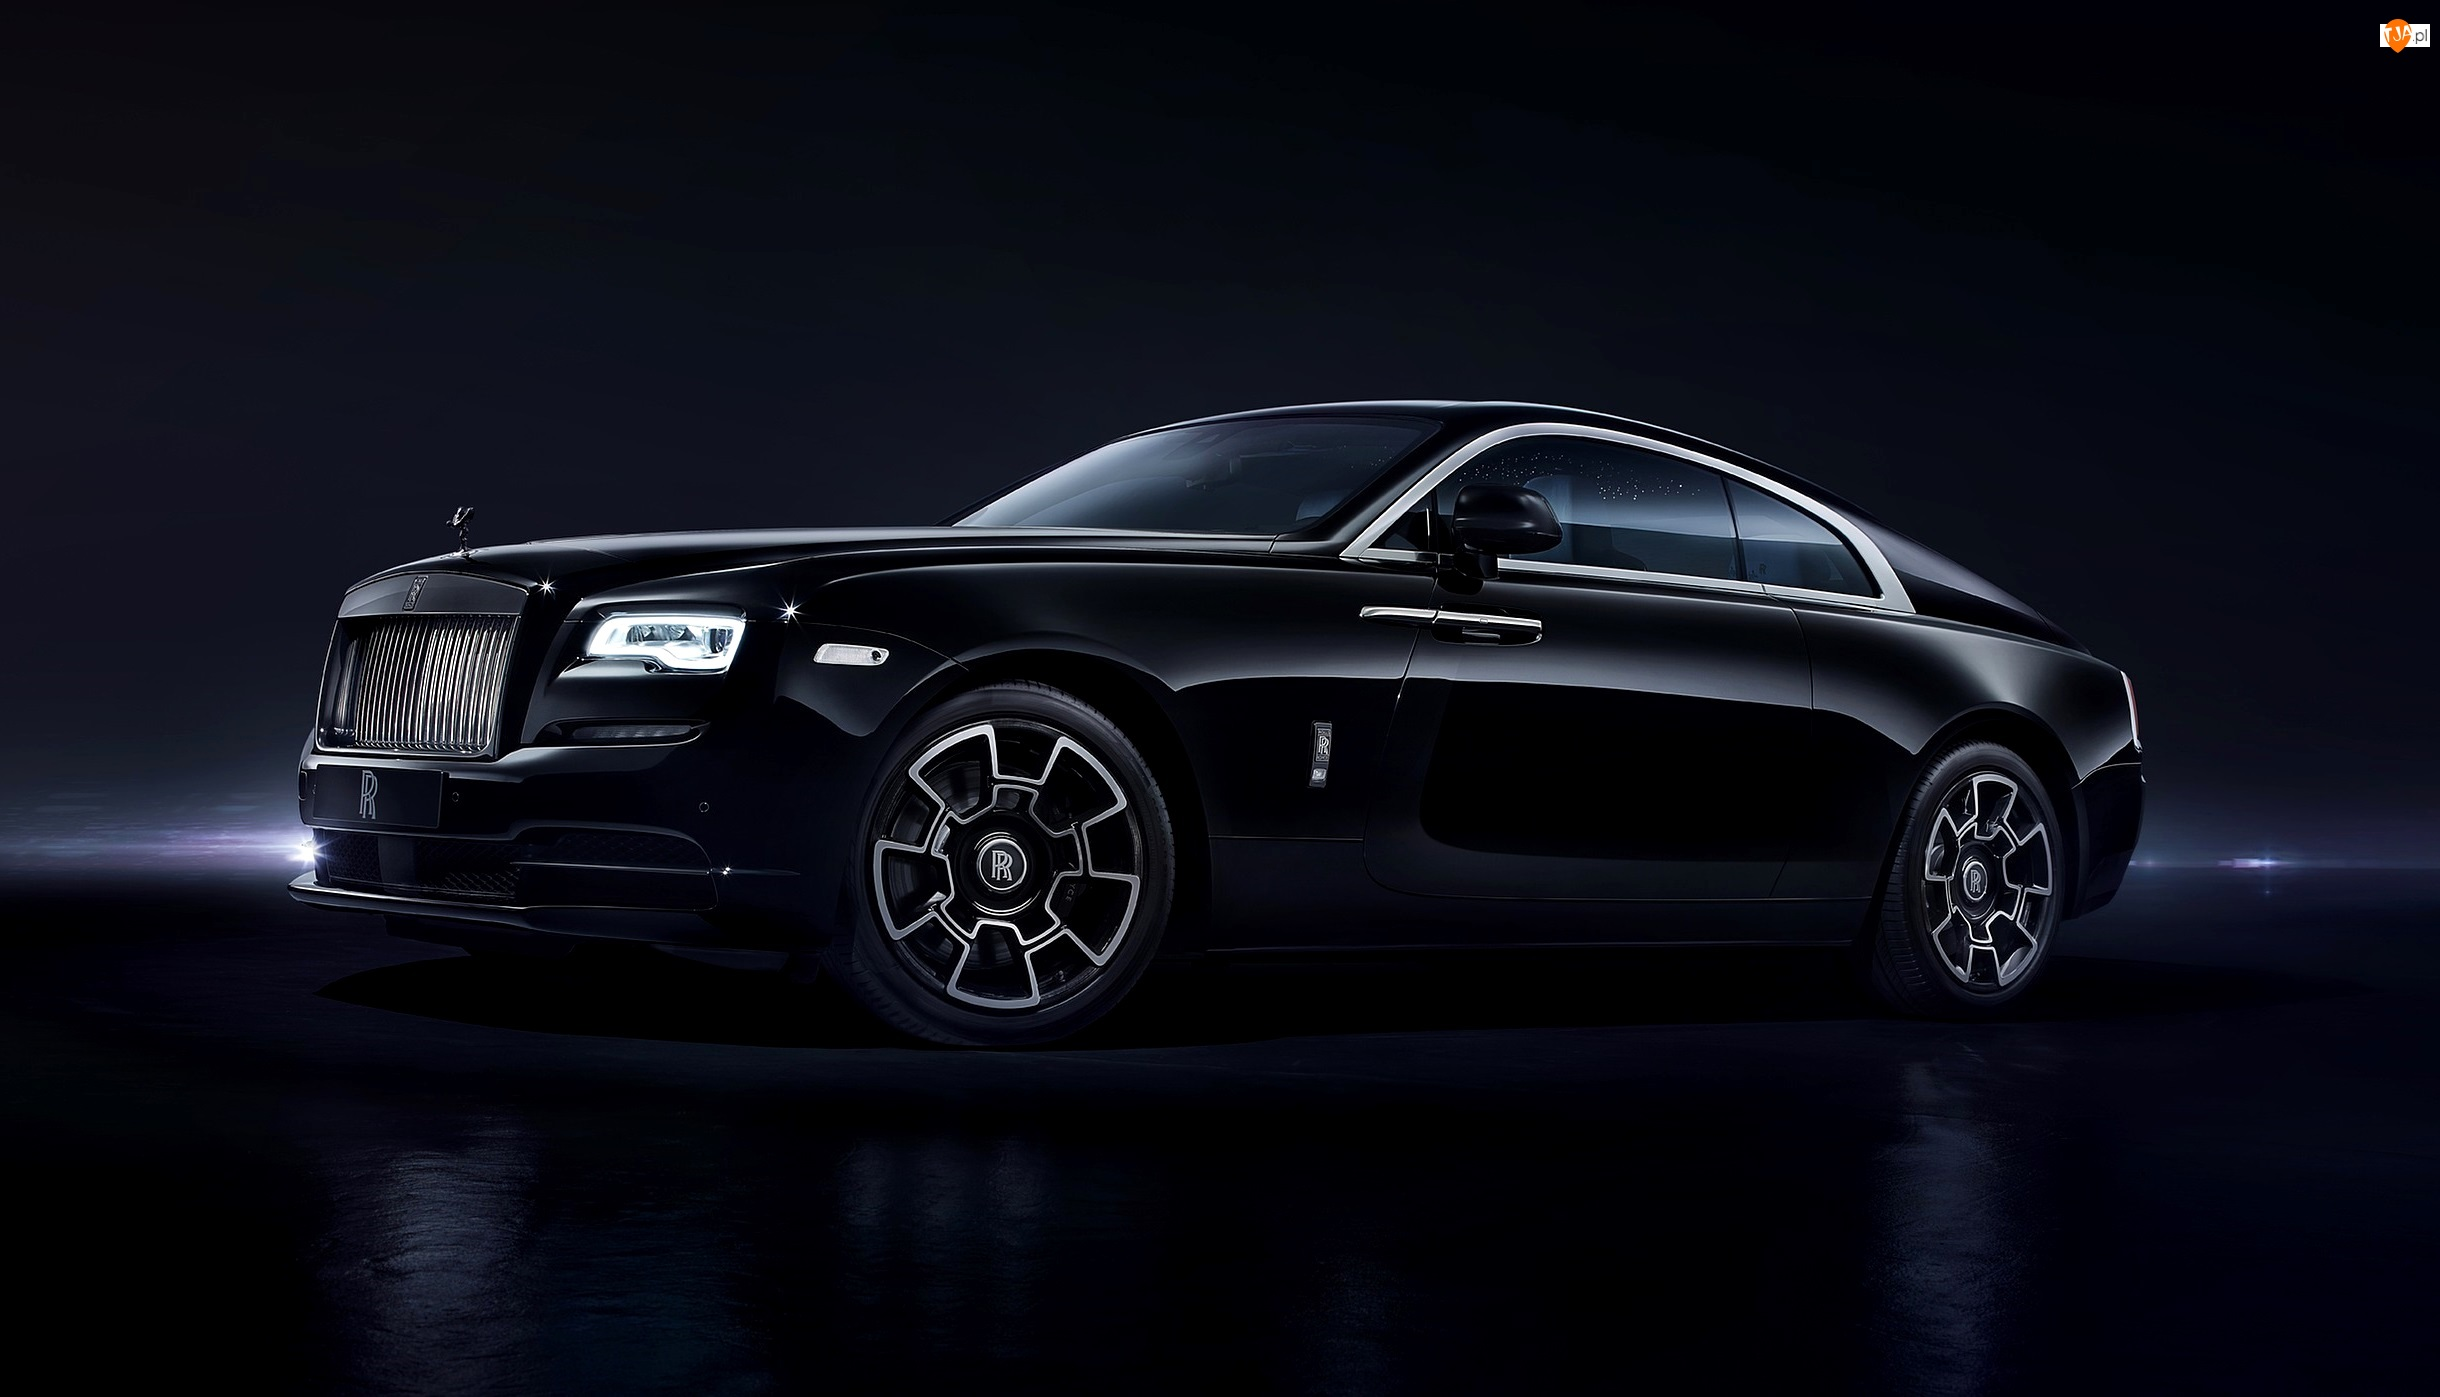 Rolls-Royce Wraith Black Badge, 2016